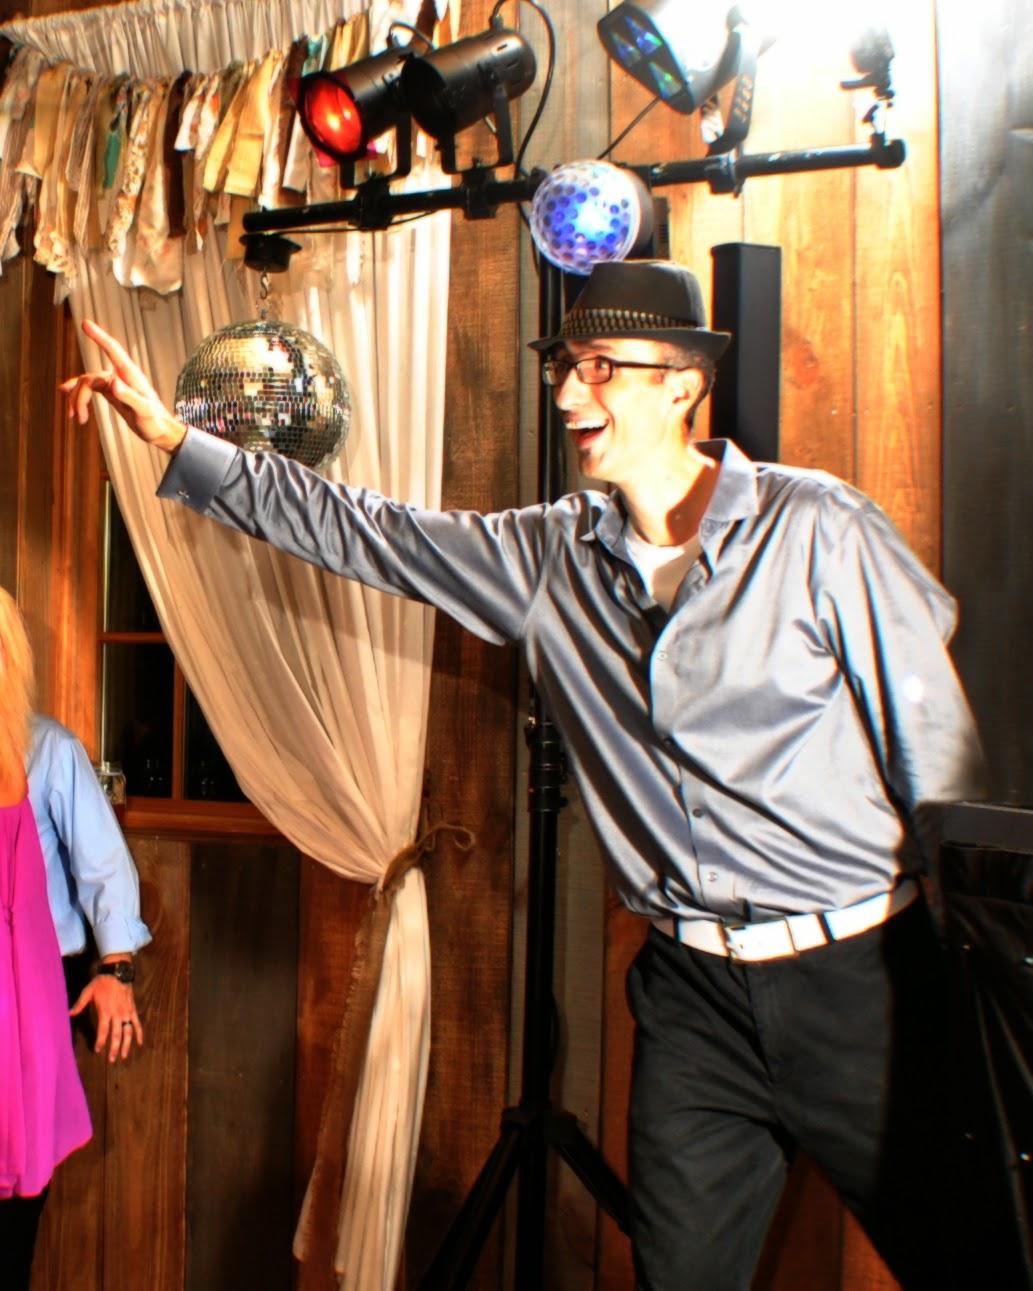 With Class LLC Wedding Coordination Party DJ - The Barn at High Point Farms - Flintstone, GA - DJ Mark